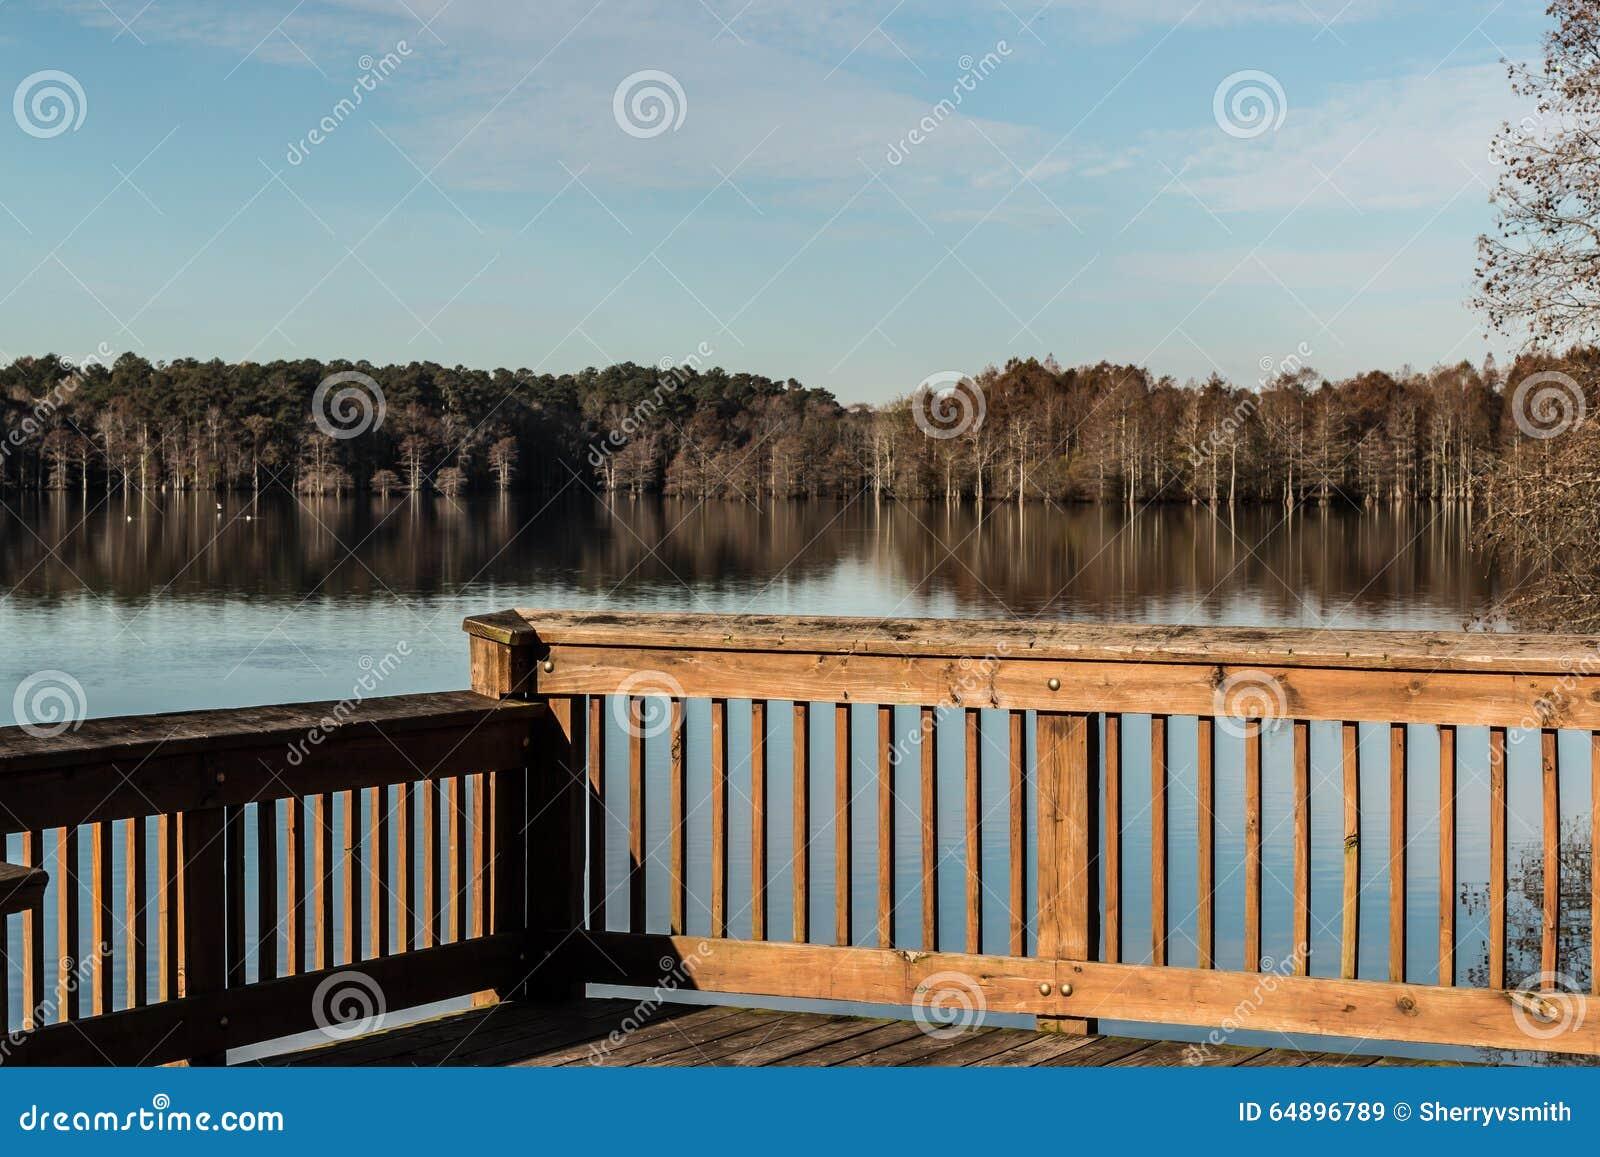 Stumpy Lake in Fall from Fishing Pier